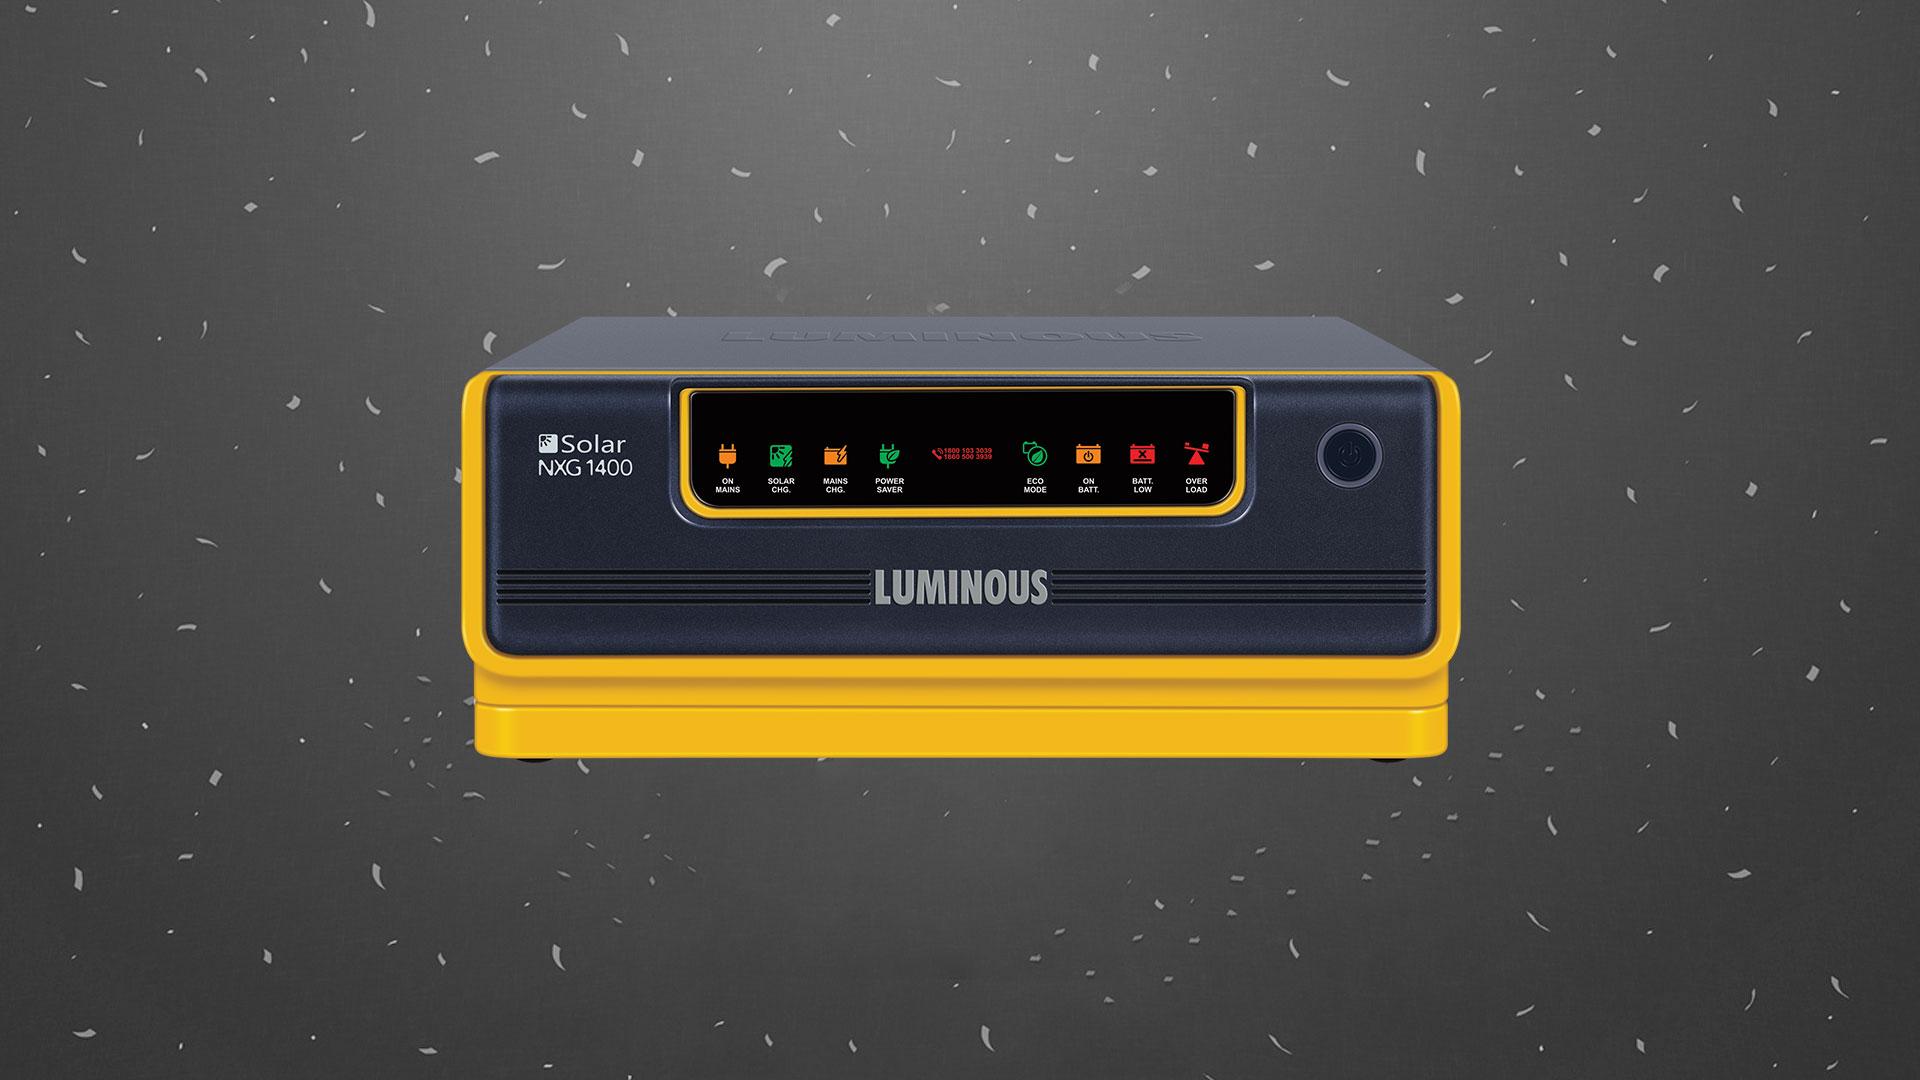 Luminous Solar NXG 1400 Inverter UPS